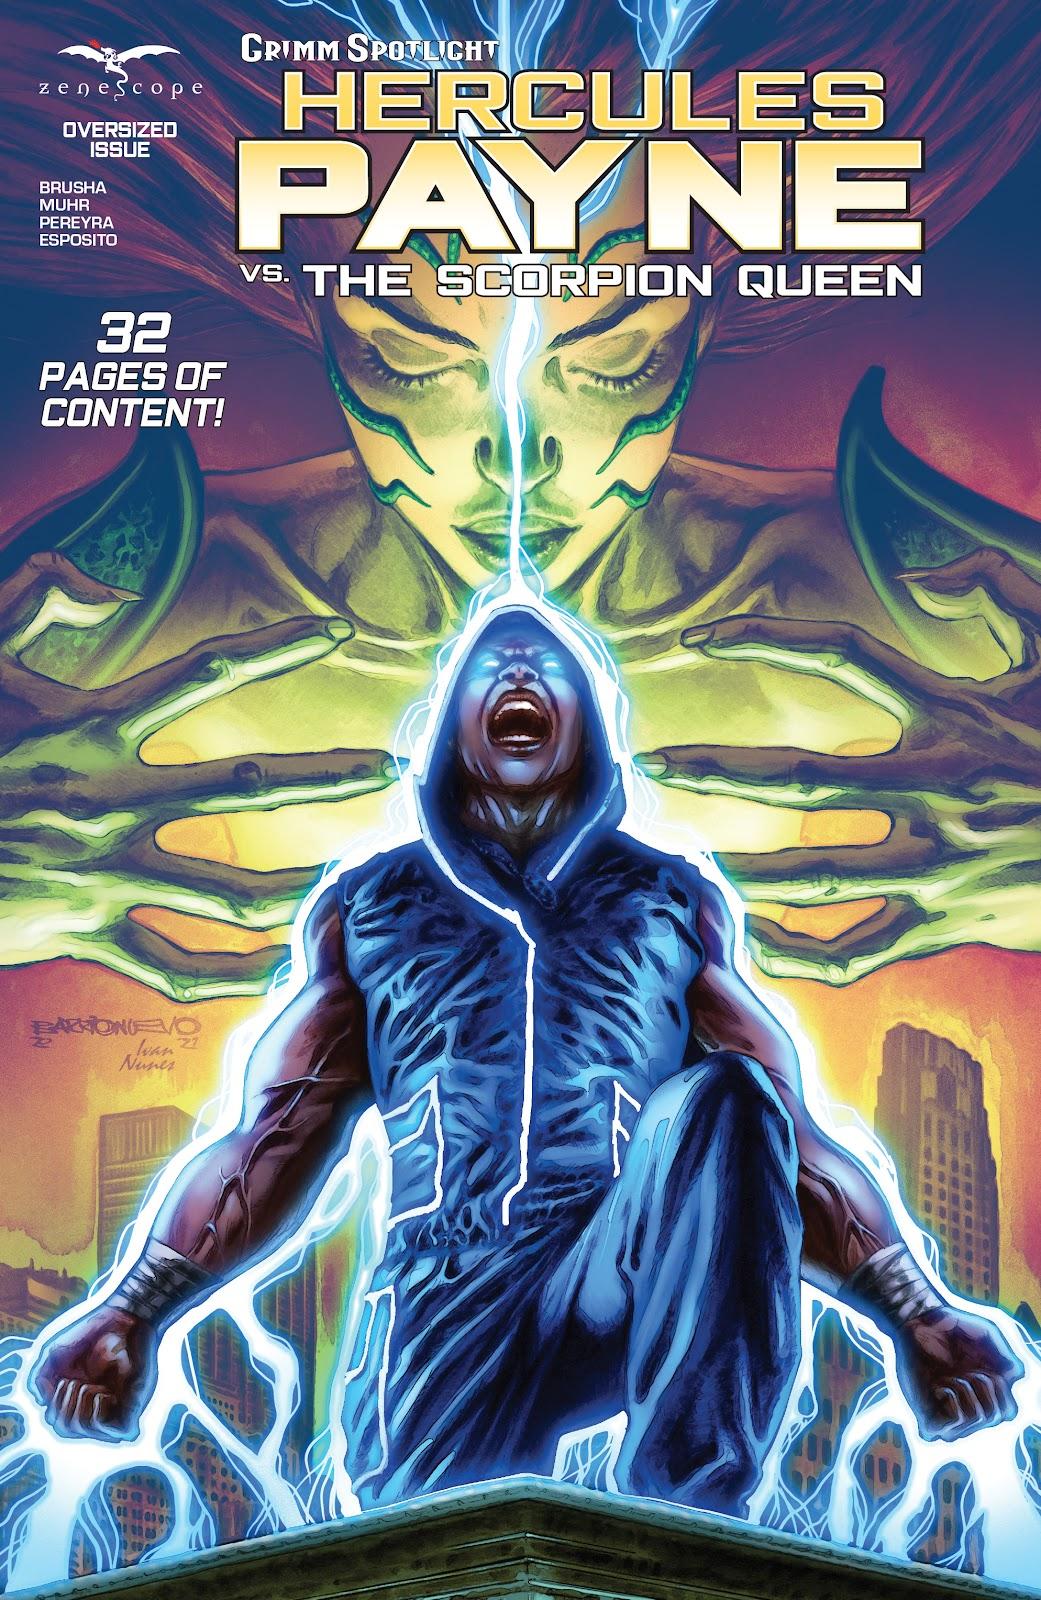 Grimm Spotlight: Hercules Payne vs Scorpion Queen Full Page 1